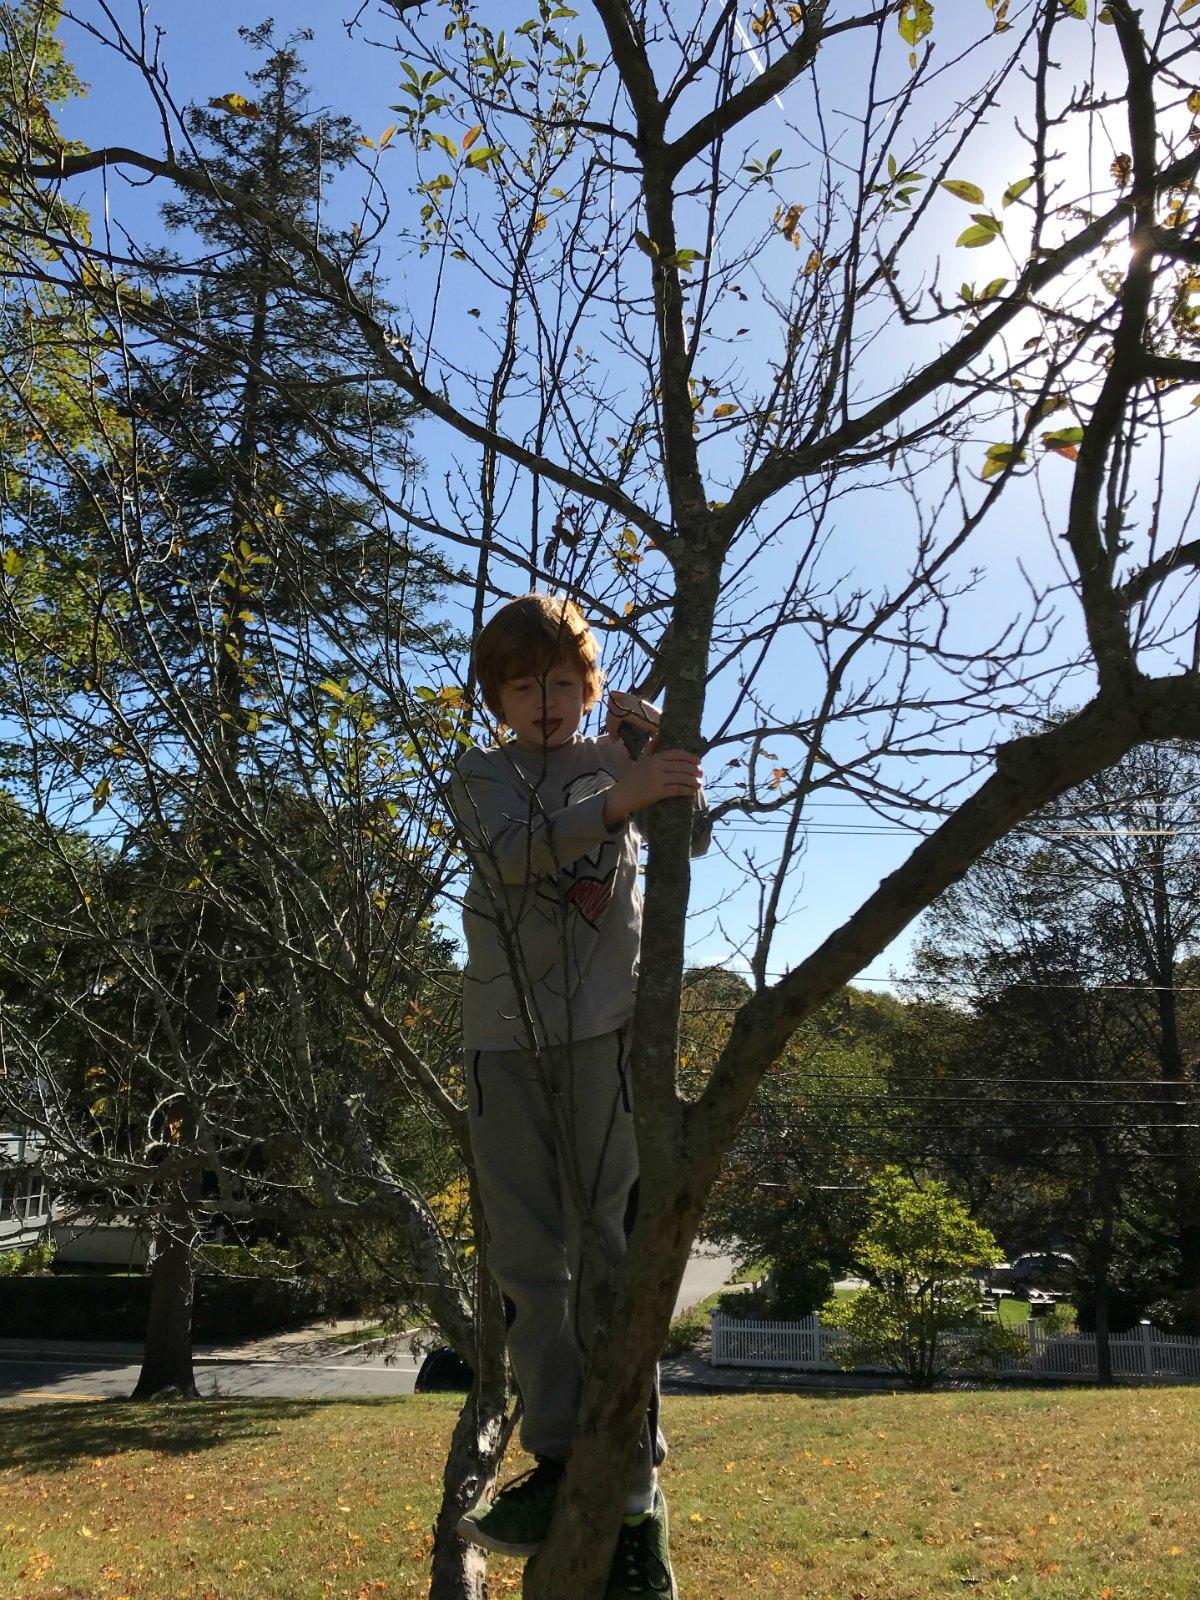 Snapshots from tree climbing adventures 3